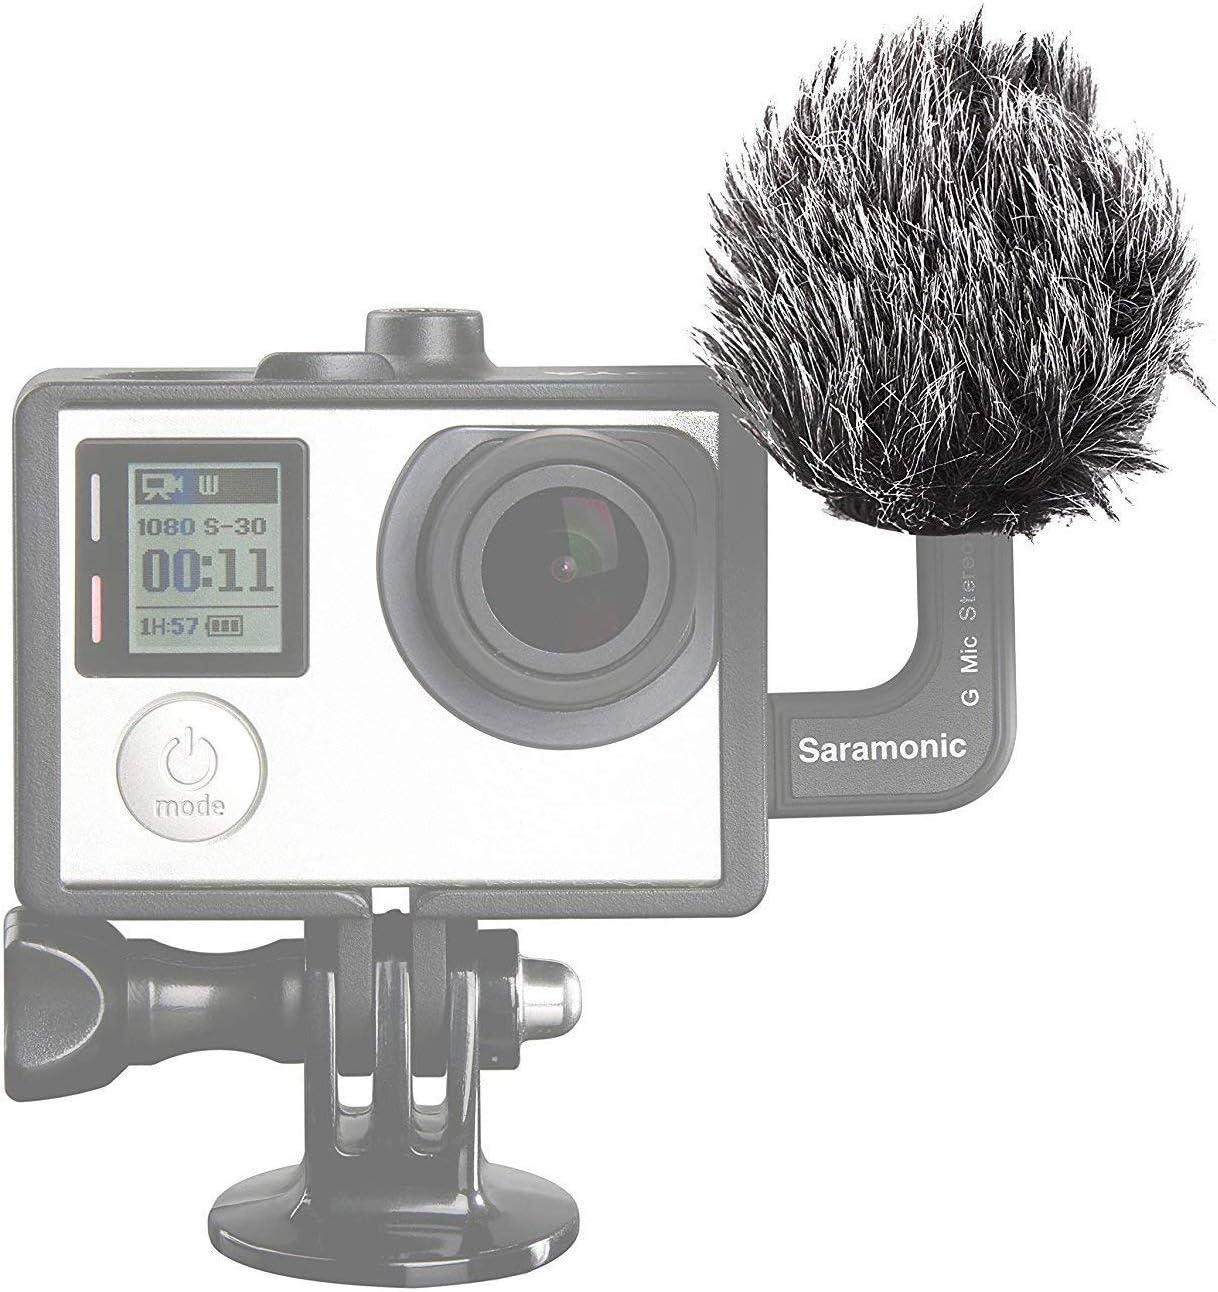 Saramonic G-Mic Stereo Ball Gopro Microphone with Foam /& Furry Windscreens for GoPro HERO3 HERO3 and HERO4